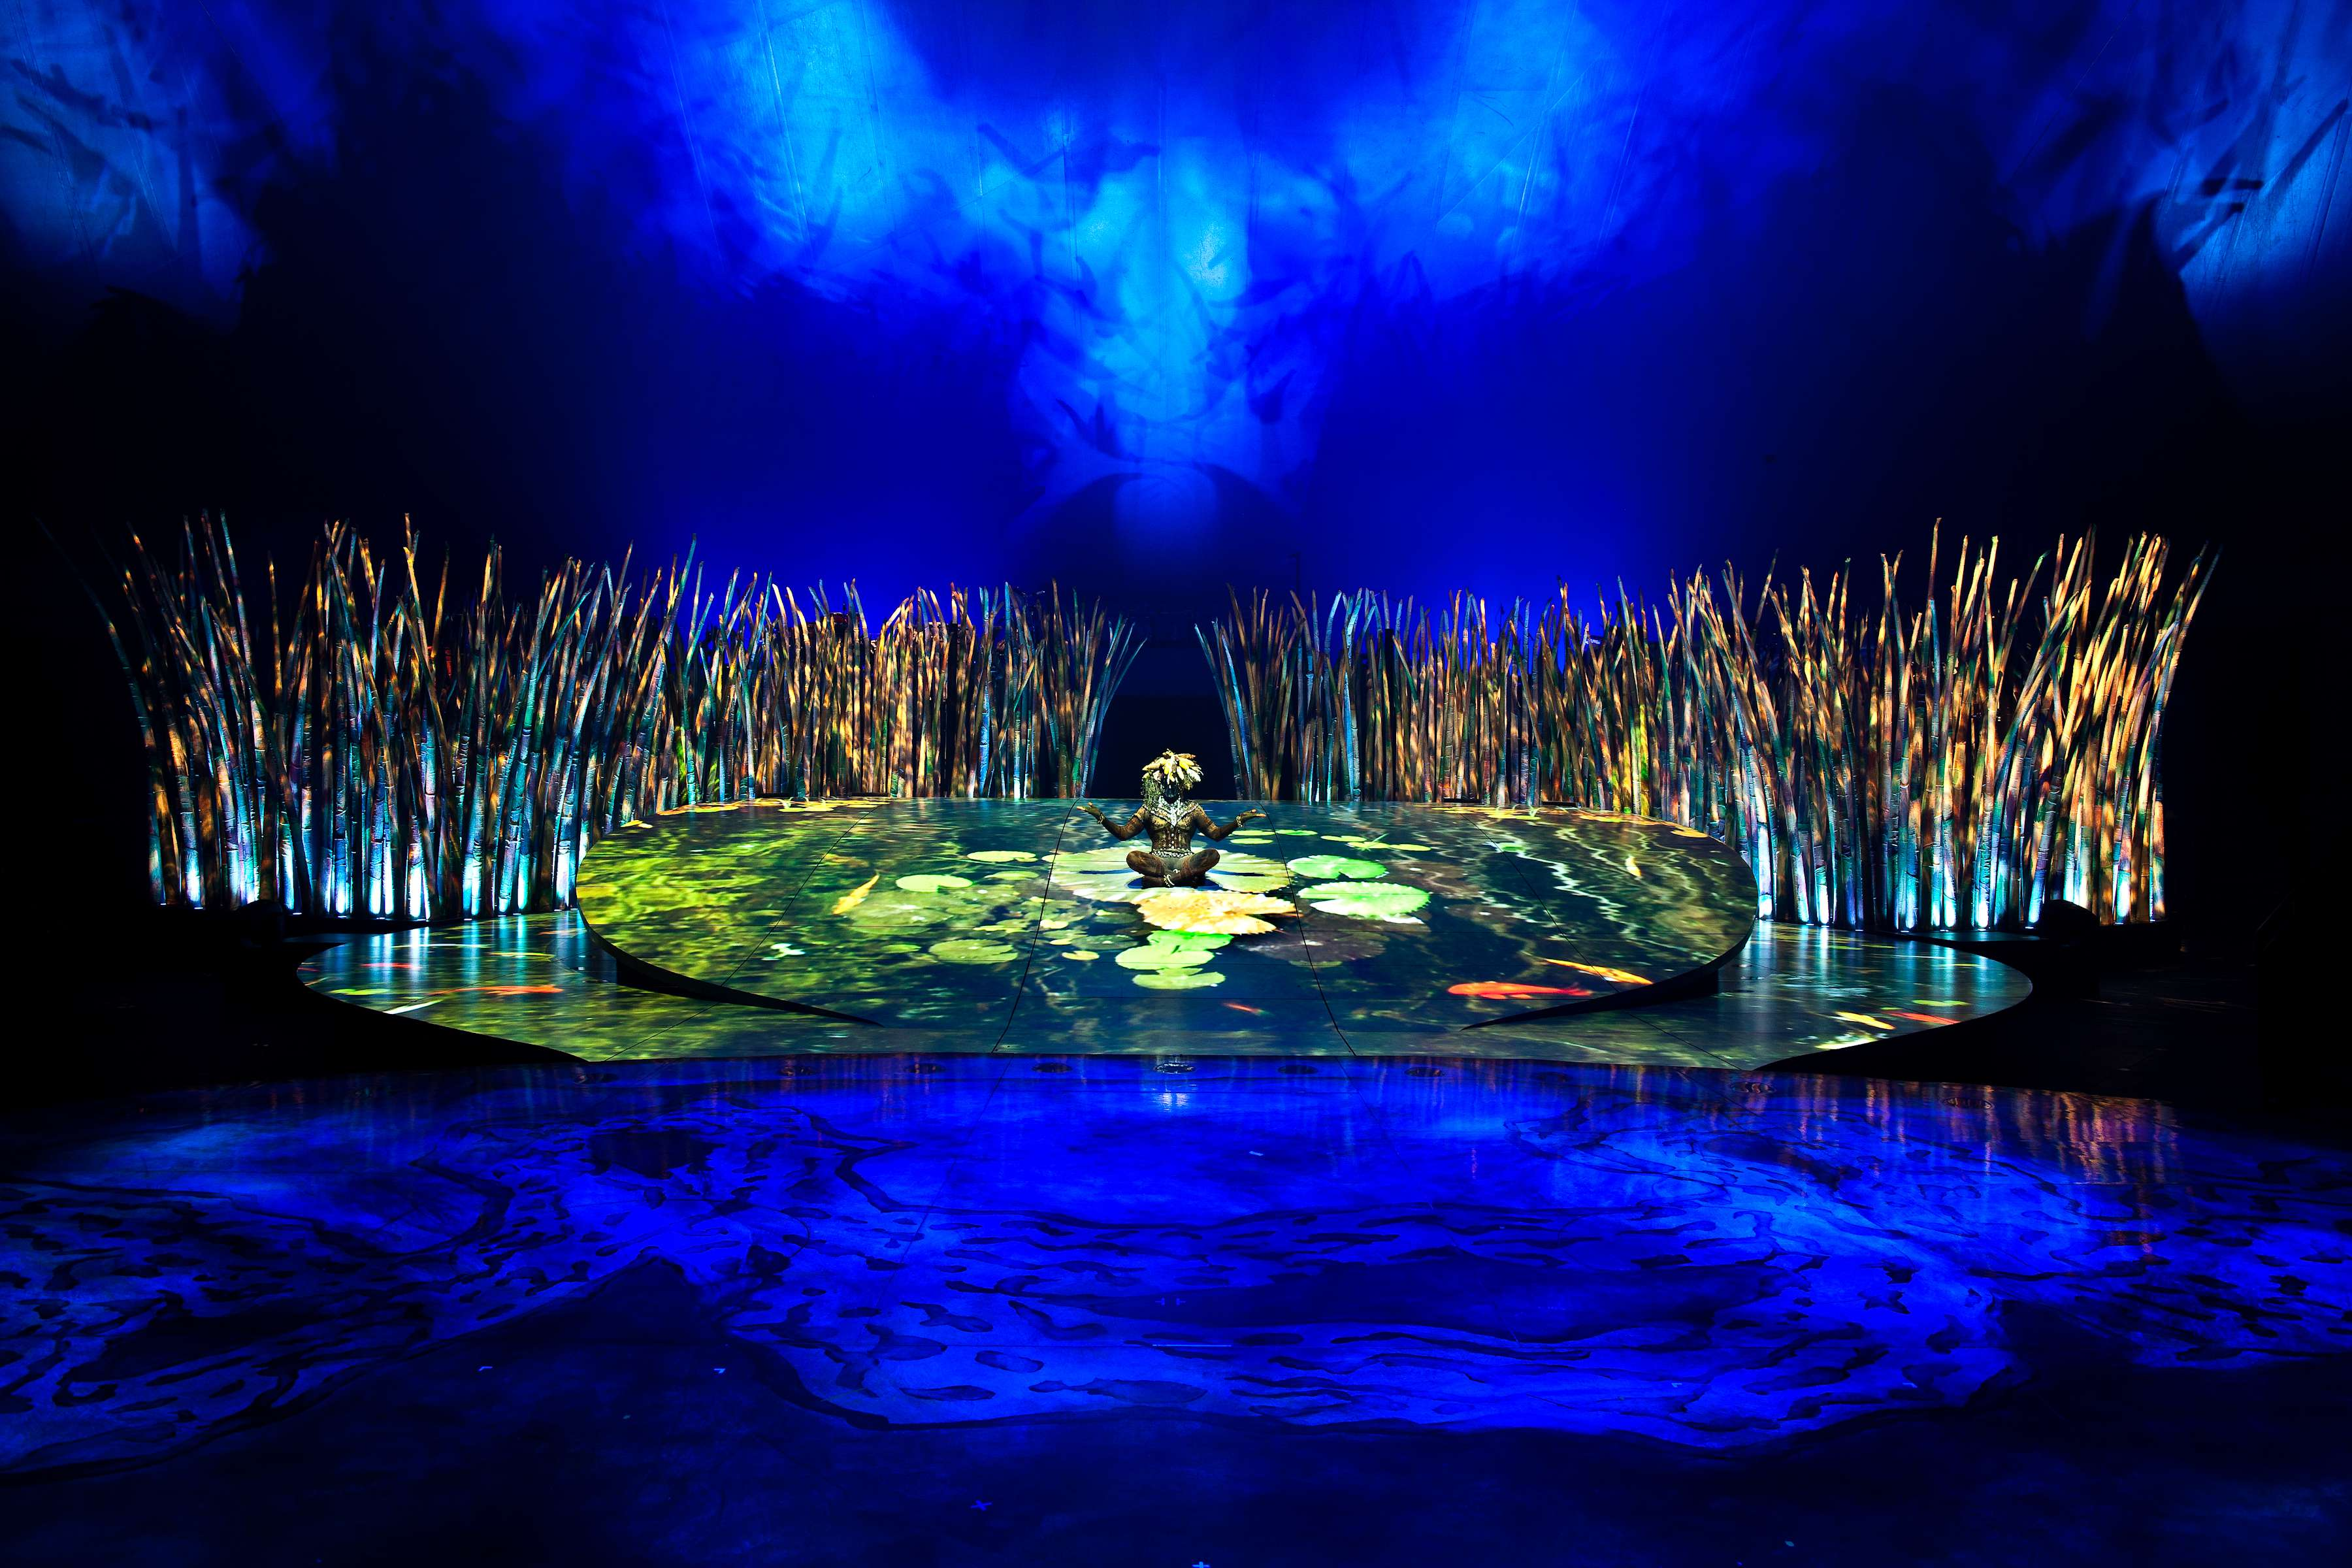 Michael Jackson Hd Wallpapers For Iphone 6 Cirque Du Soleil Totem Full Hd Fond D 233 Cran And Arri 232 Re